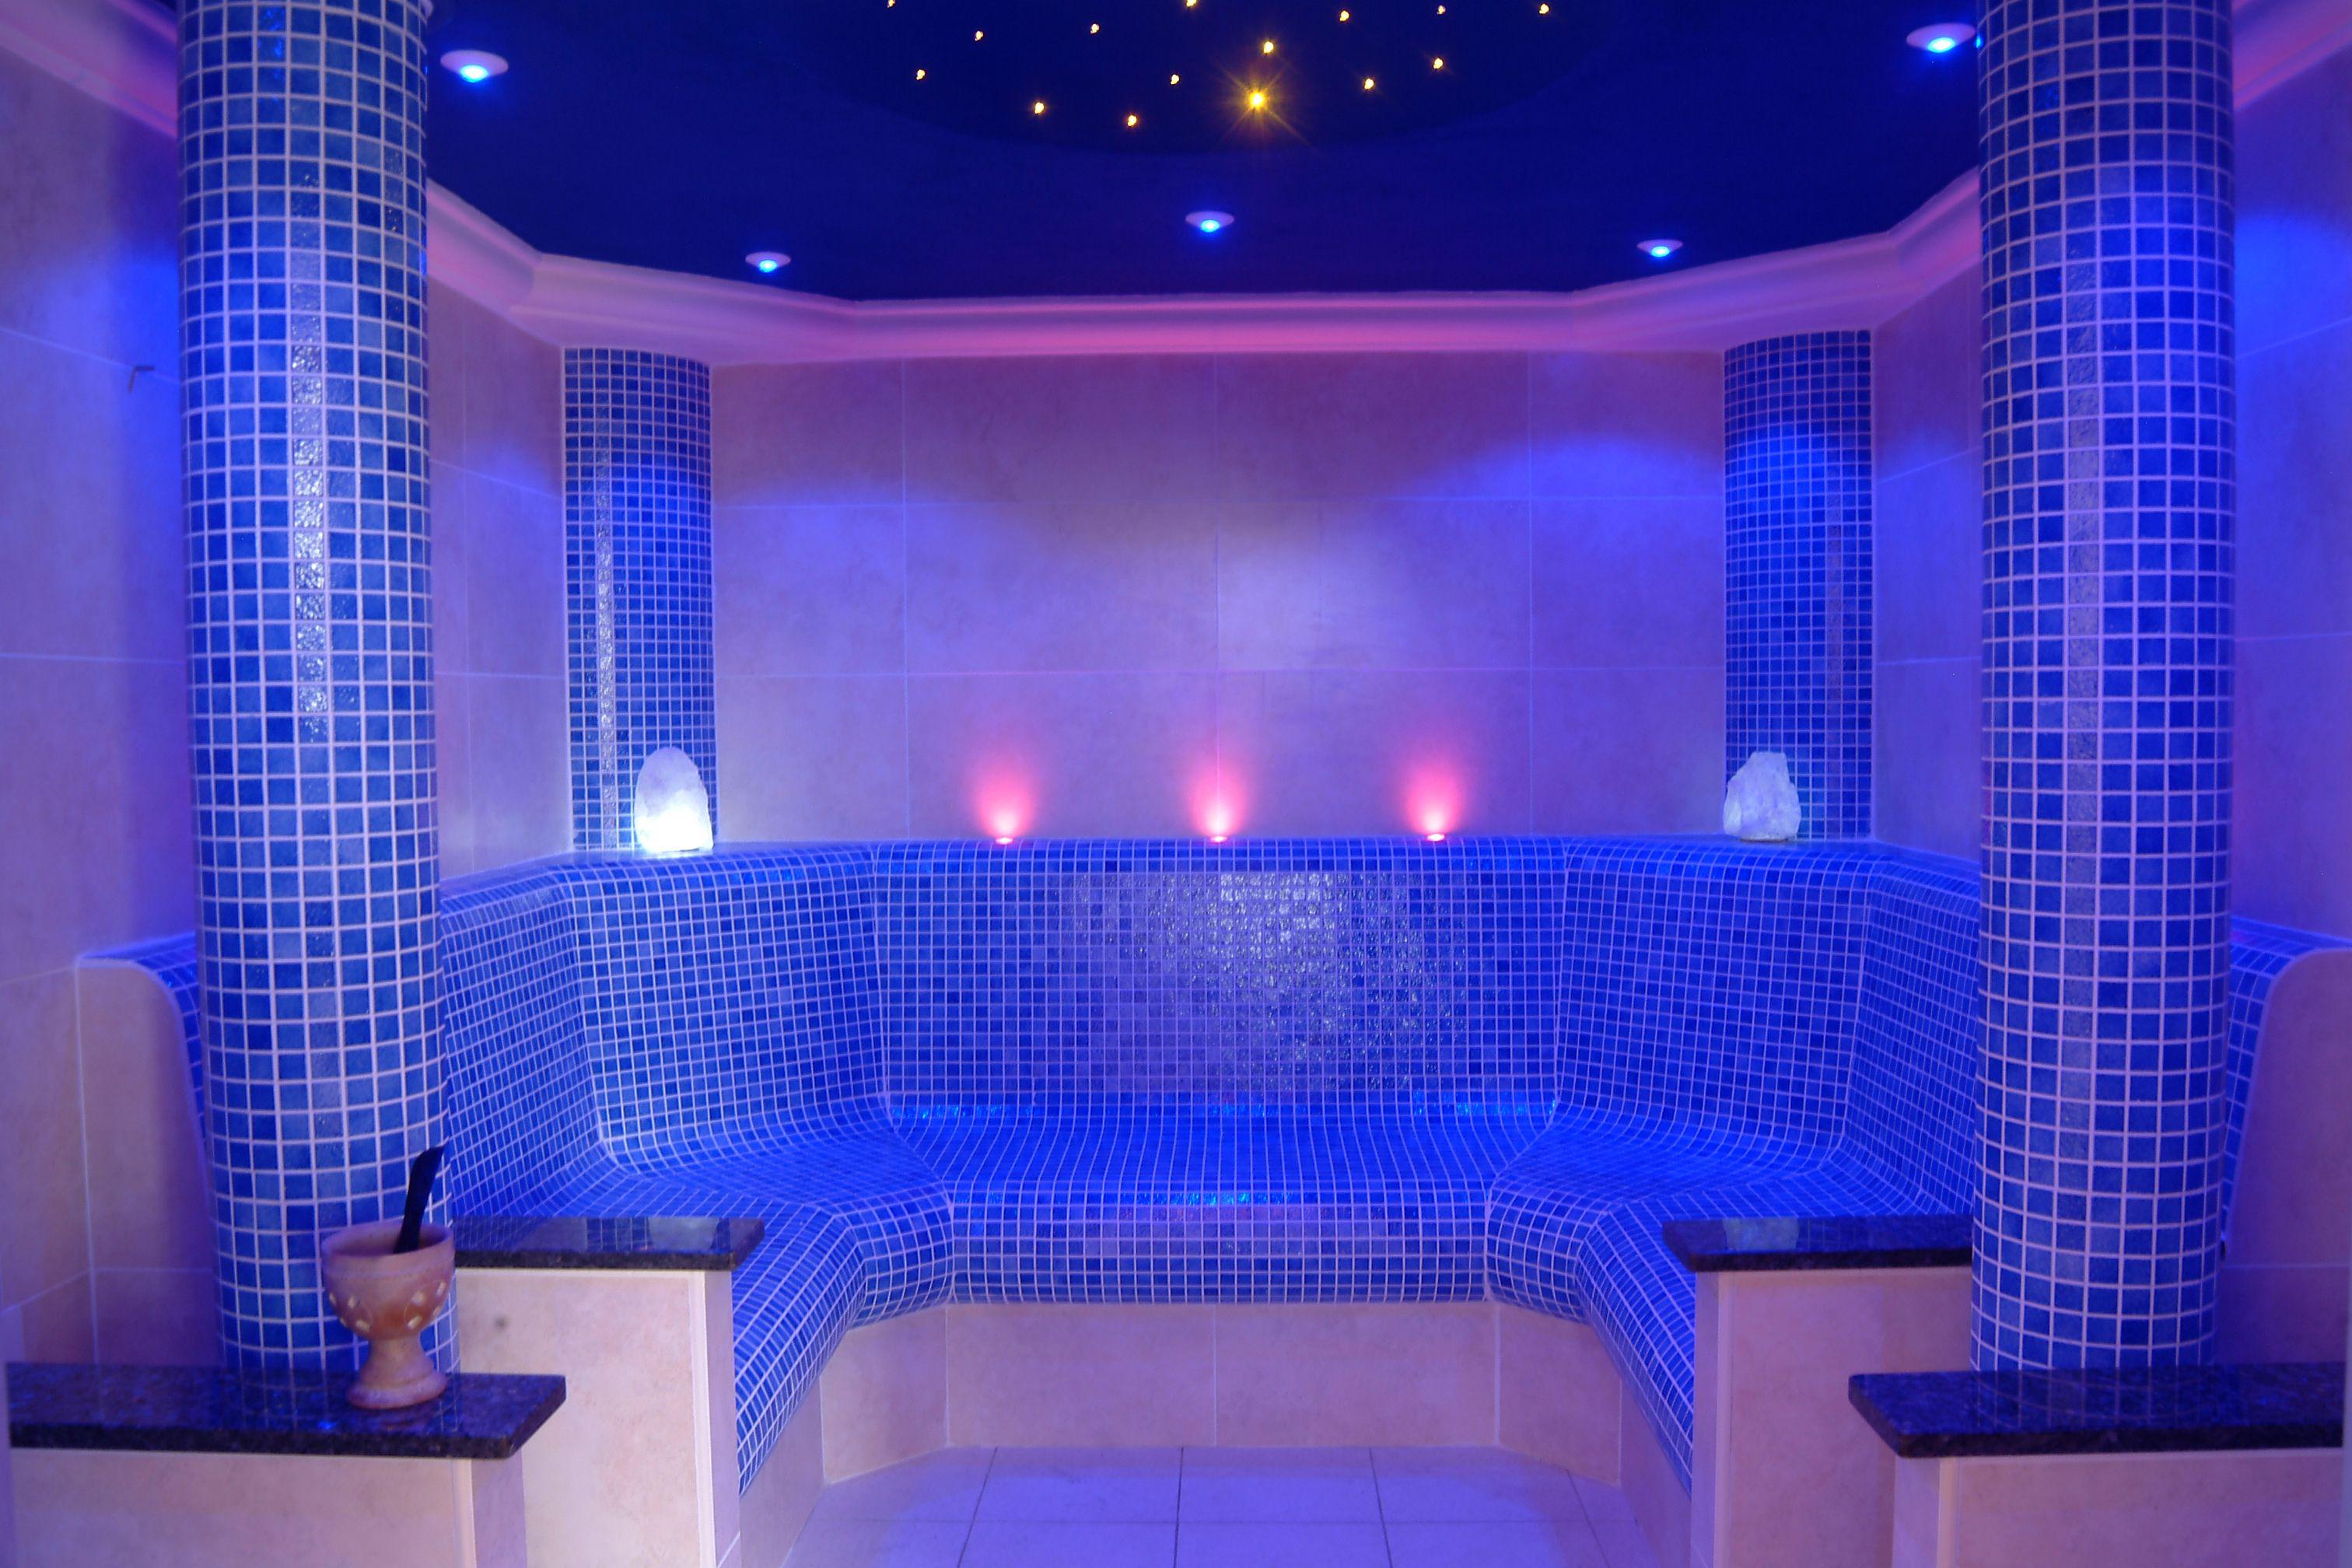 Ip Rated Step Lighting In The David Lloyd Sauna Room Relax Led Interiordesign Design Blue Warm Water Steamroom Light Steplight